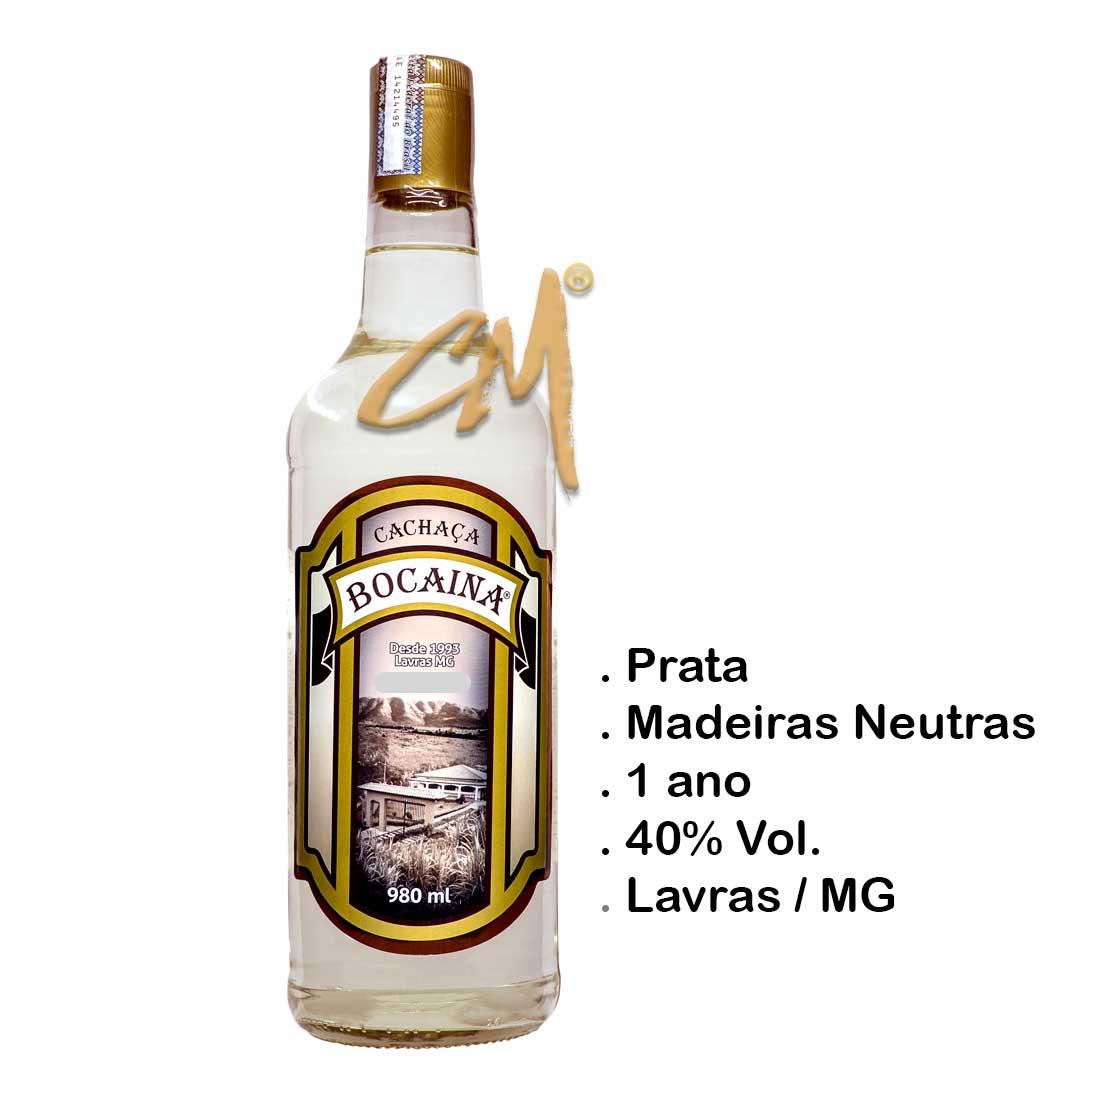 Cachaça Bocaina Prata 980 ml (Lavras - MG)